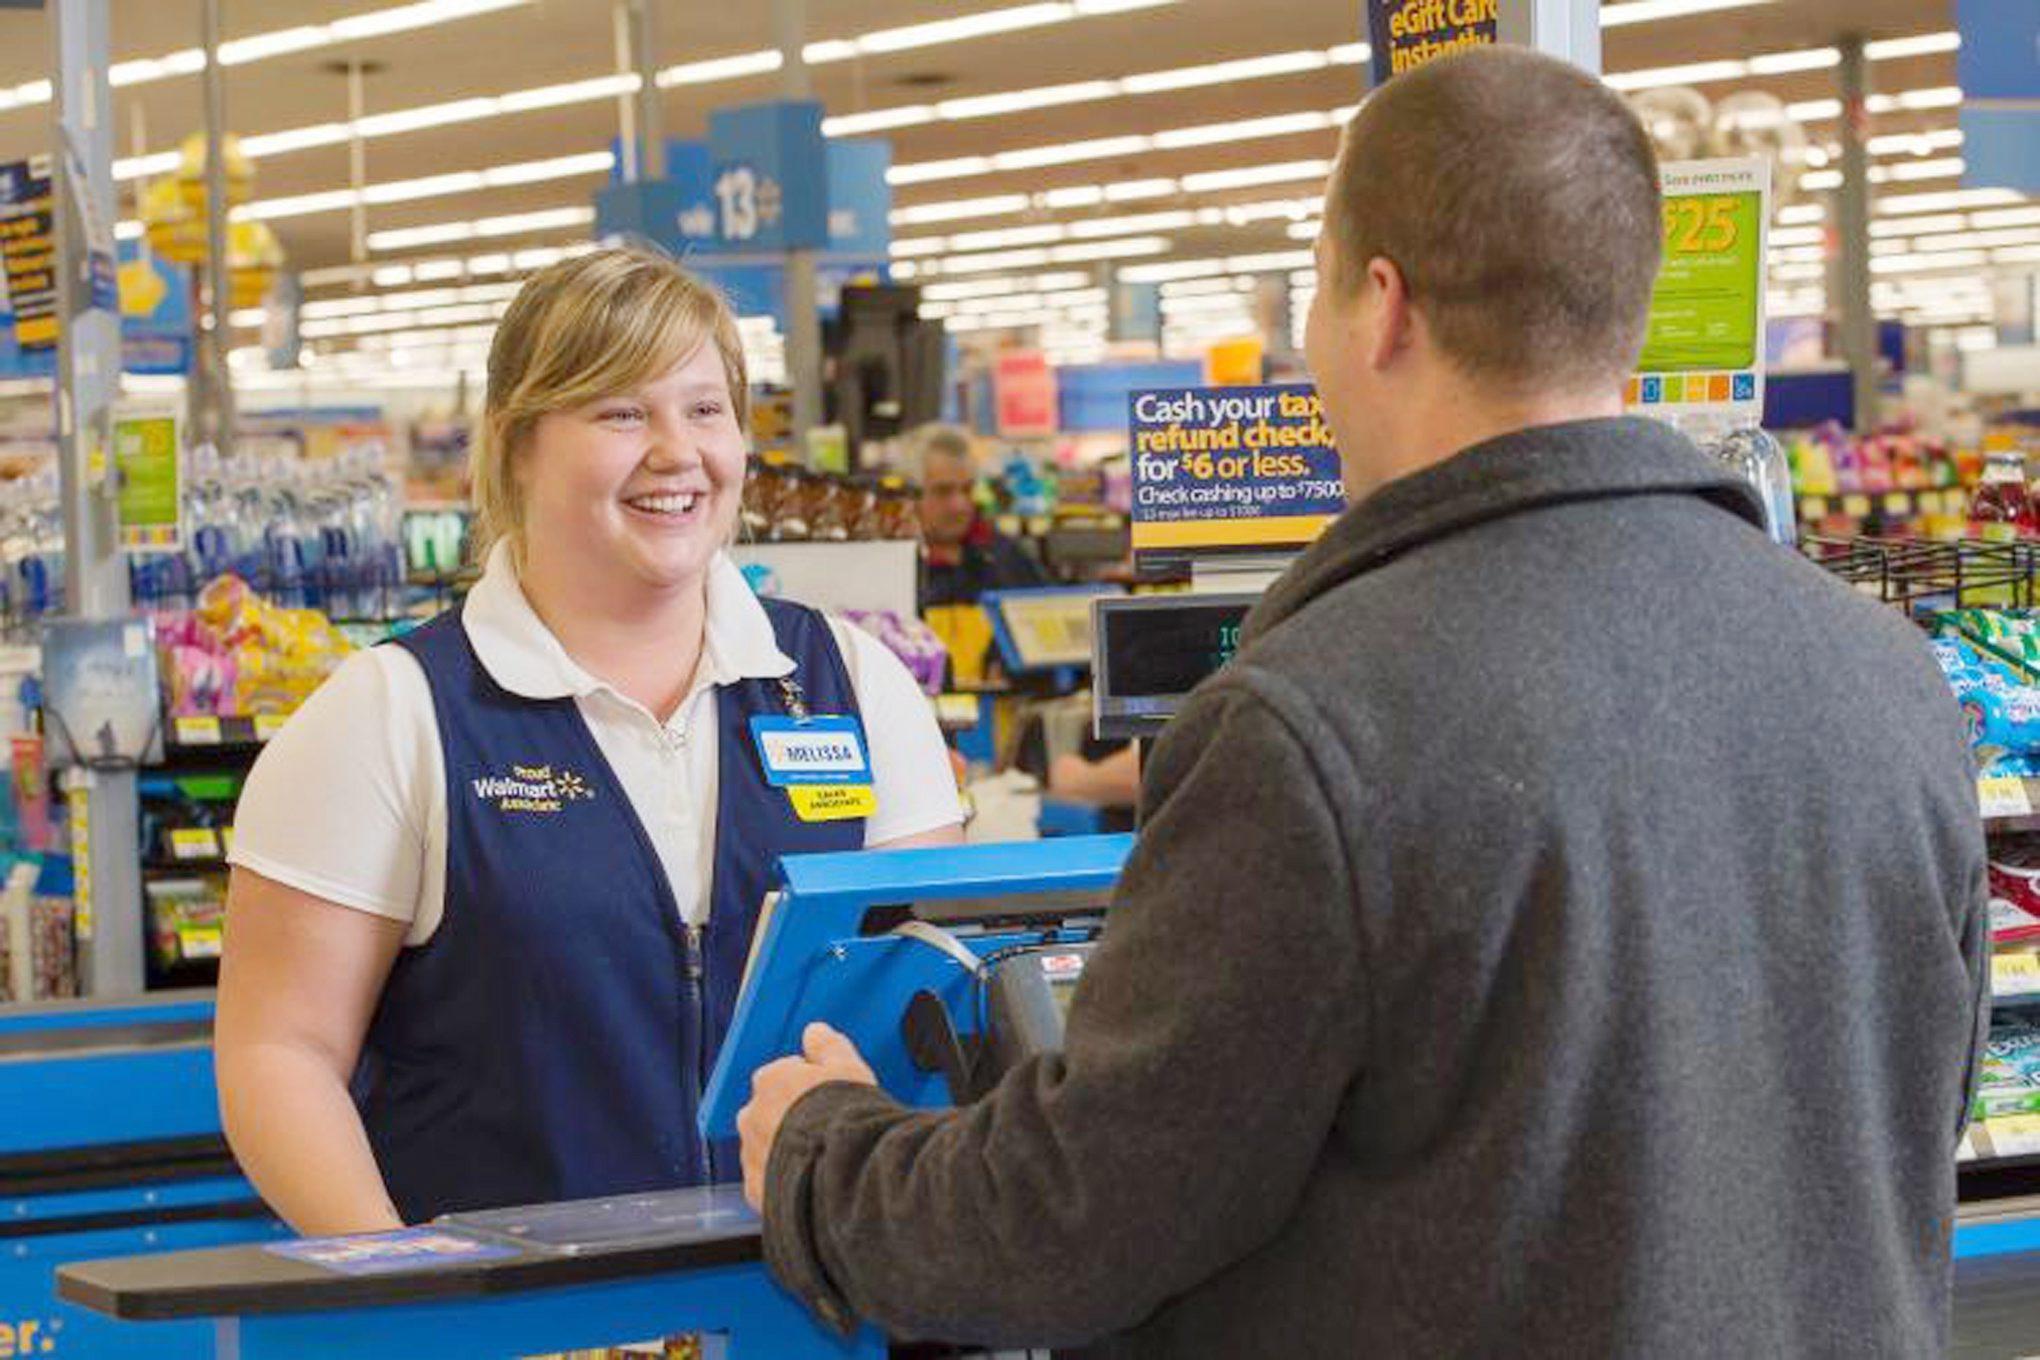 Walmart Inc. (WMT) Options Chain - Yahoo Finance